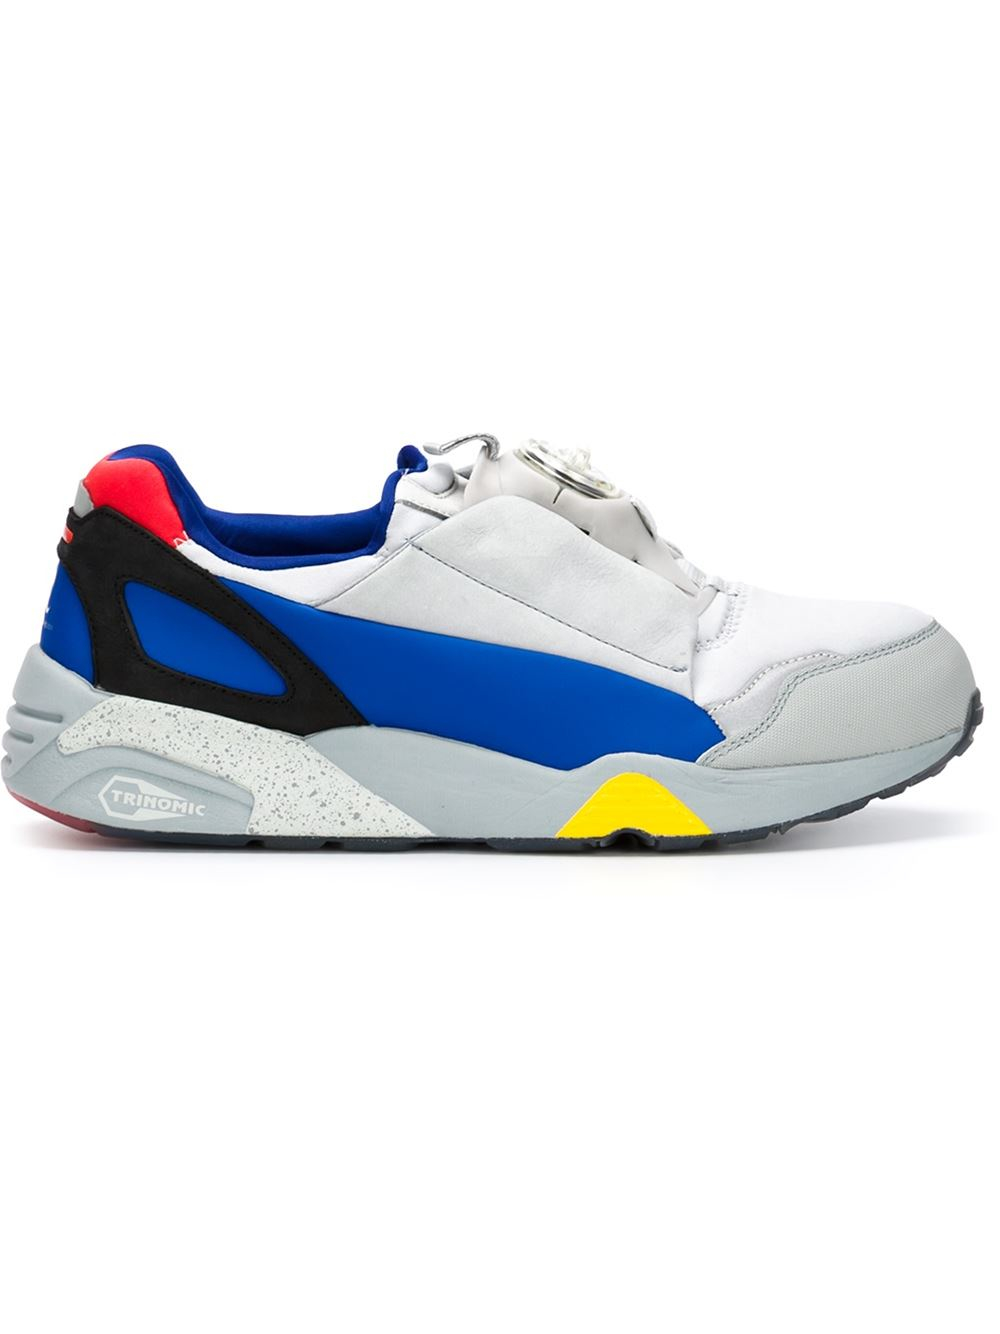 Mcqueen Puma Womens Shoes